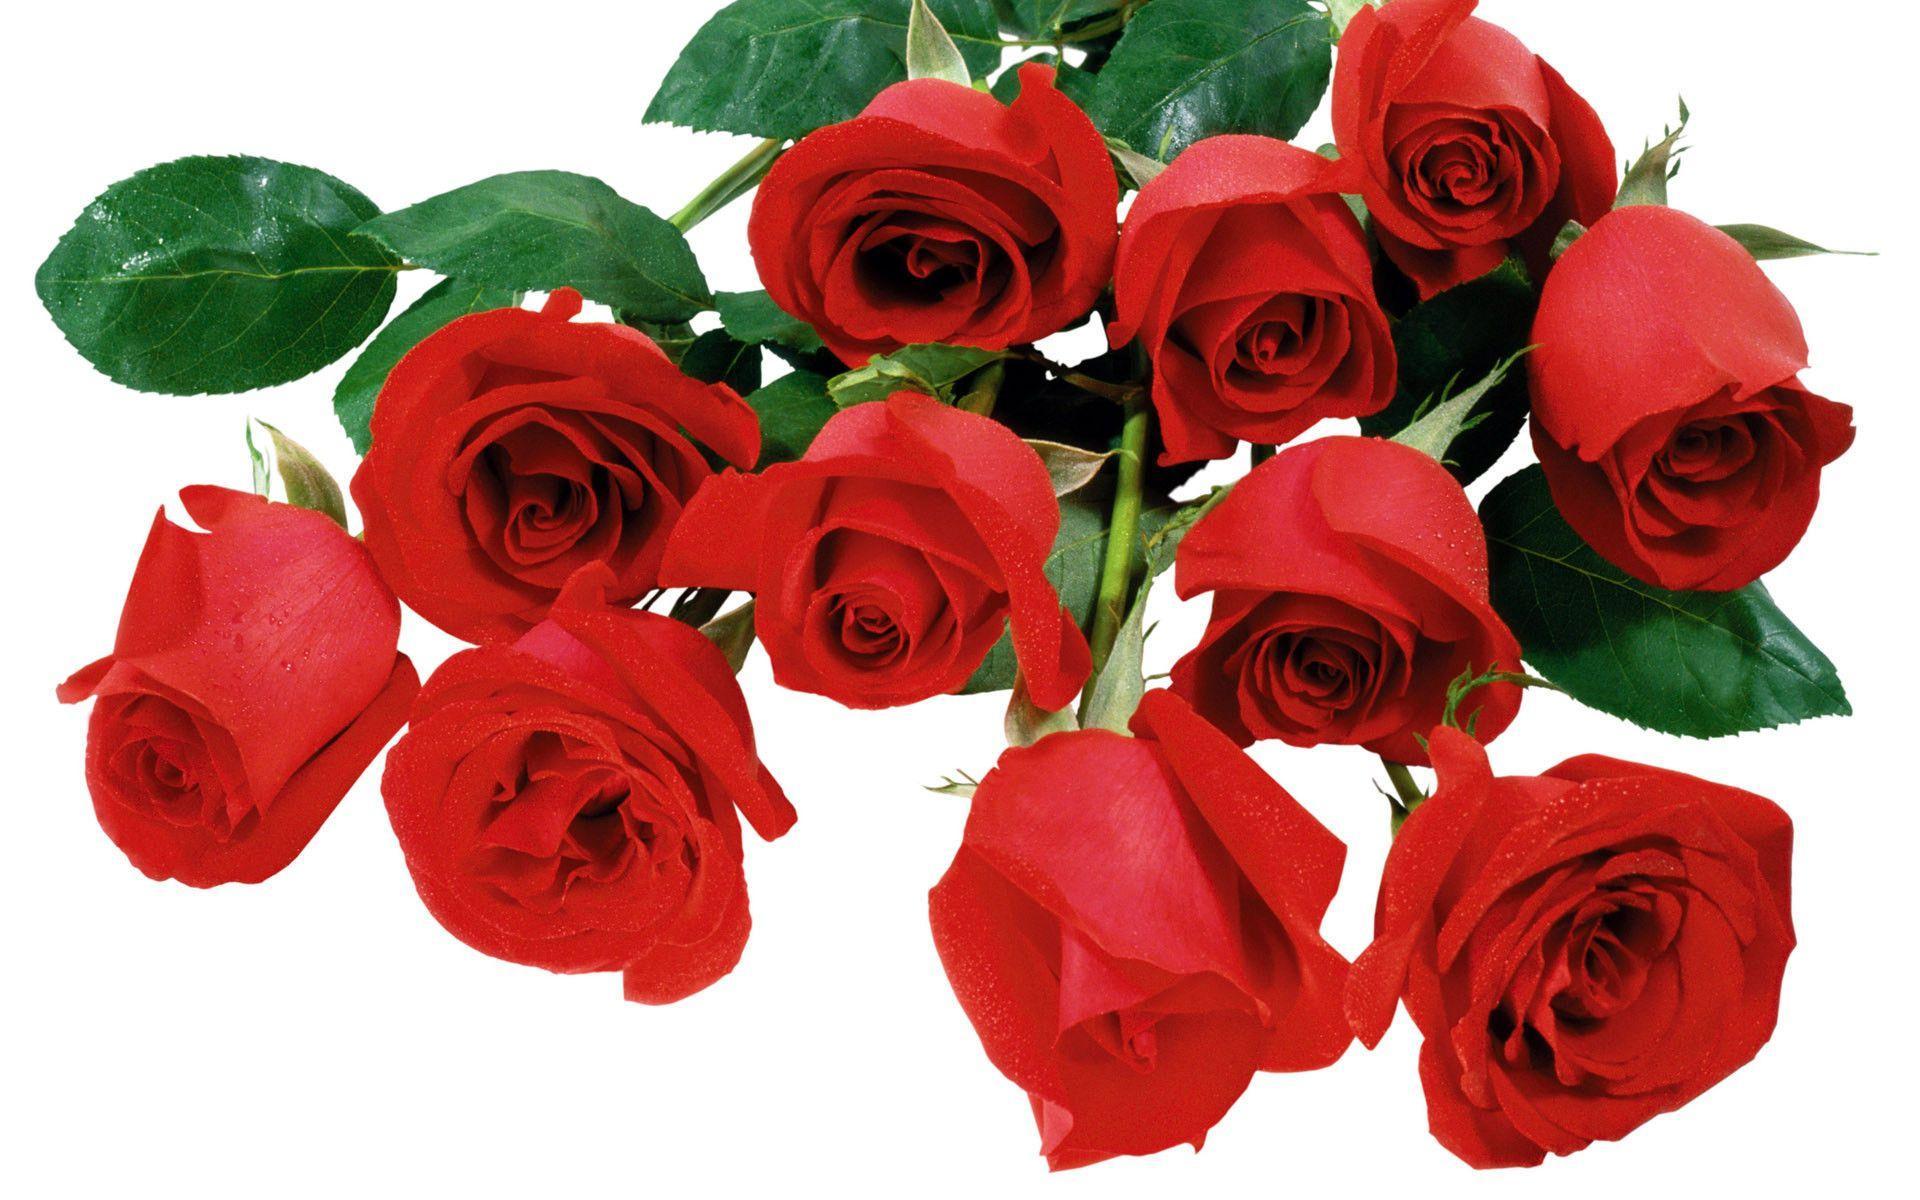 Beautiful Red Rose Flower Image HD Wallpaper 3836